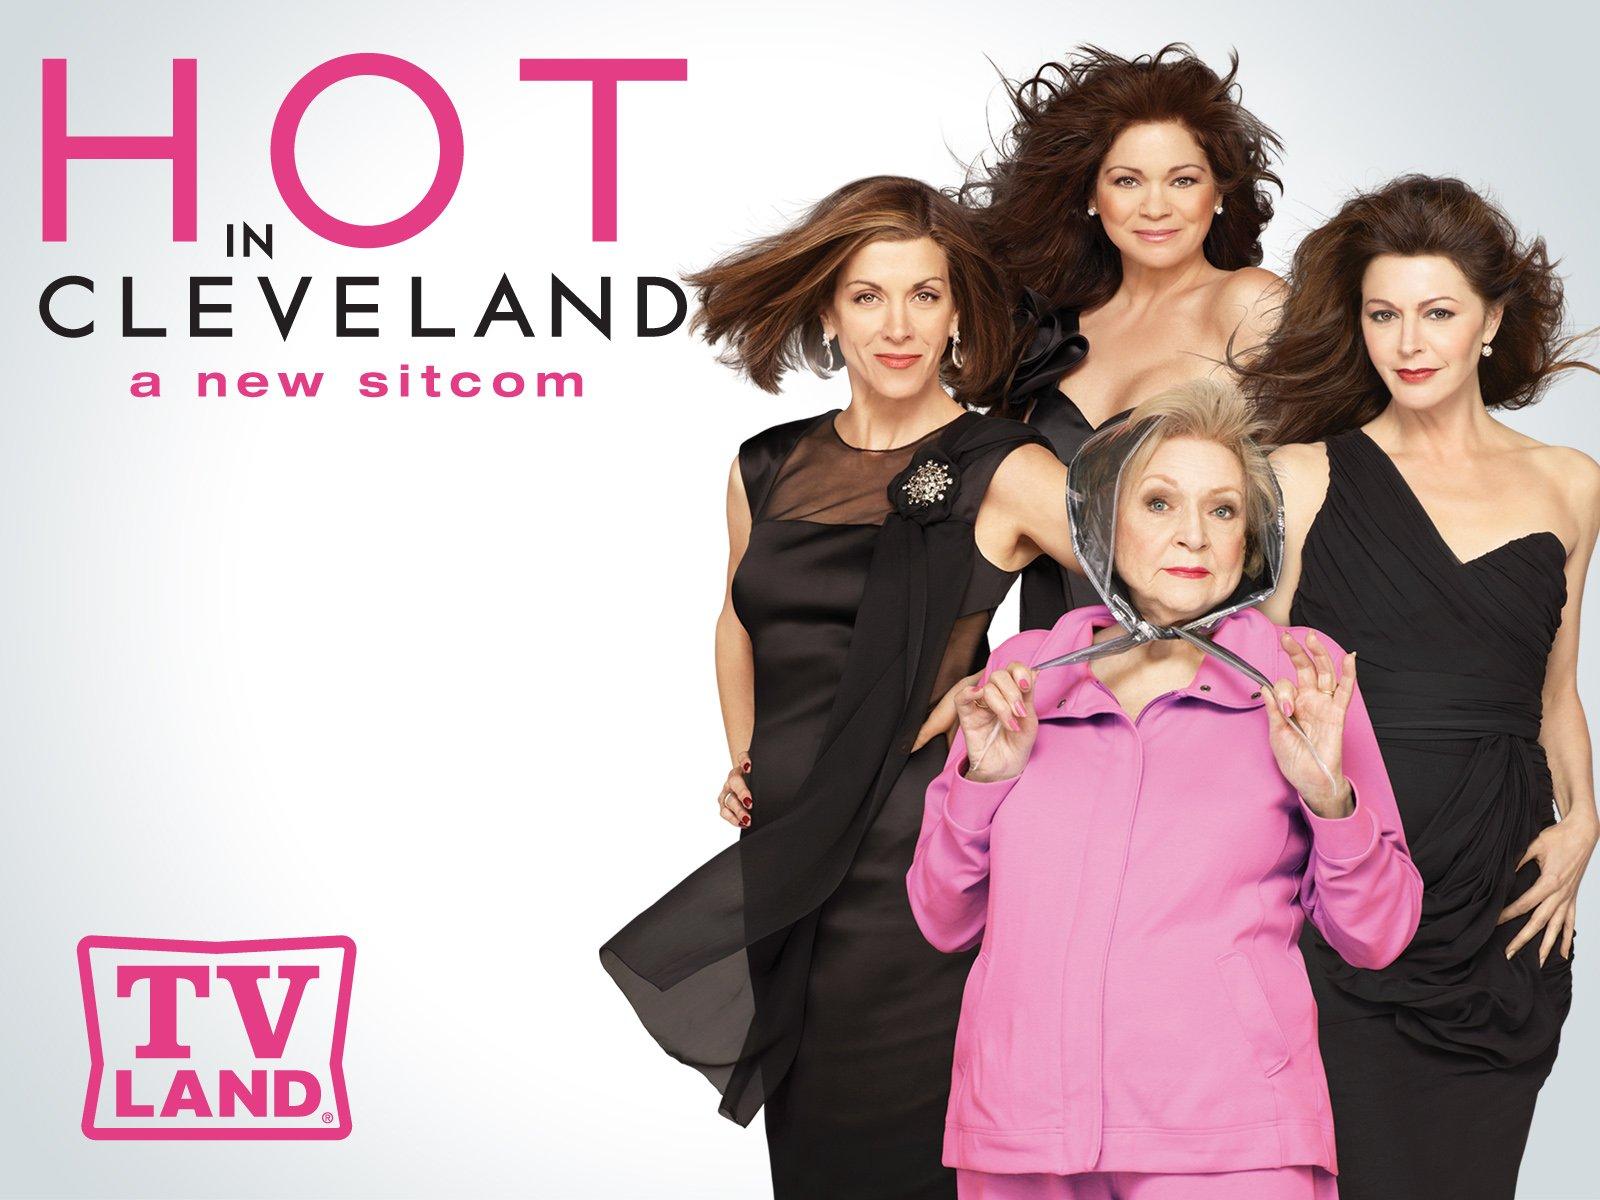 Amazon.com: Hot in Cleveland Season 1: Betty White, Valerie Bertinelli, Wendie Malick, Jane Leeves: Amazon Digital Services LLC